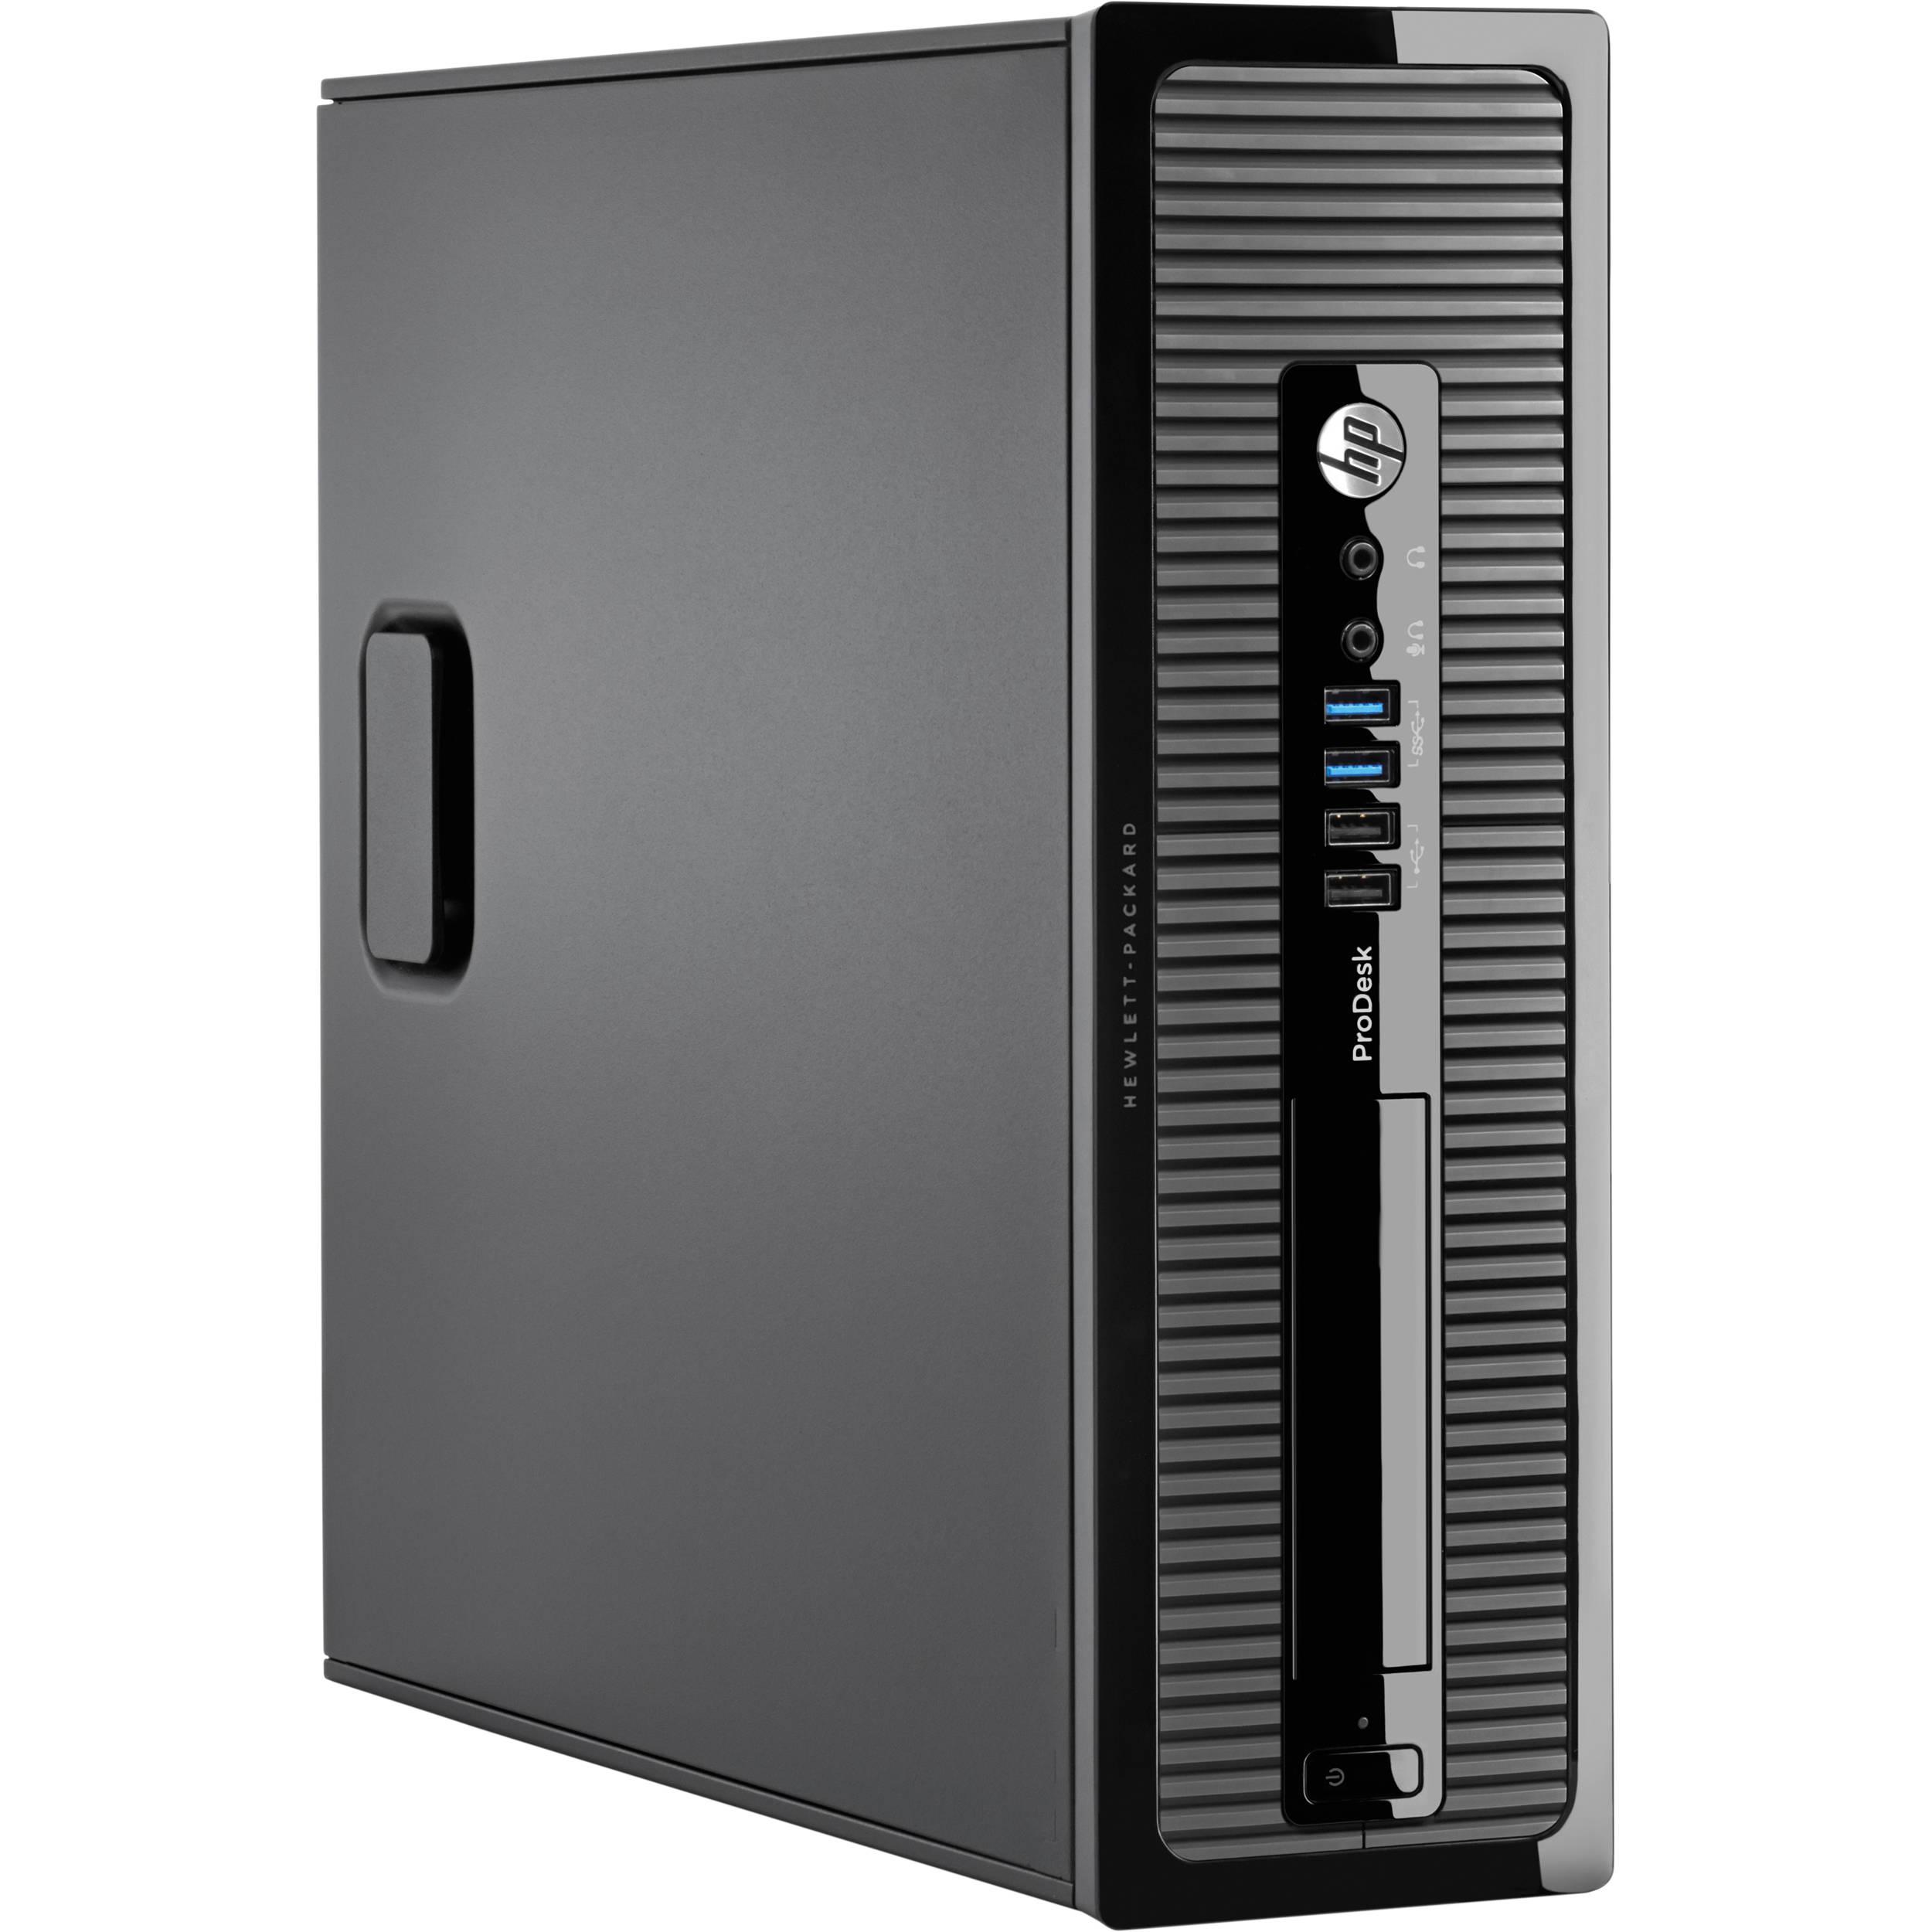 REPLAY PC HP 400 G1 I5-4570 4GB 500GB WIN 10 PRO (UPG. DA WIN 8 PRO)